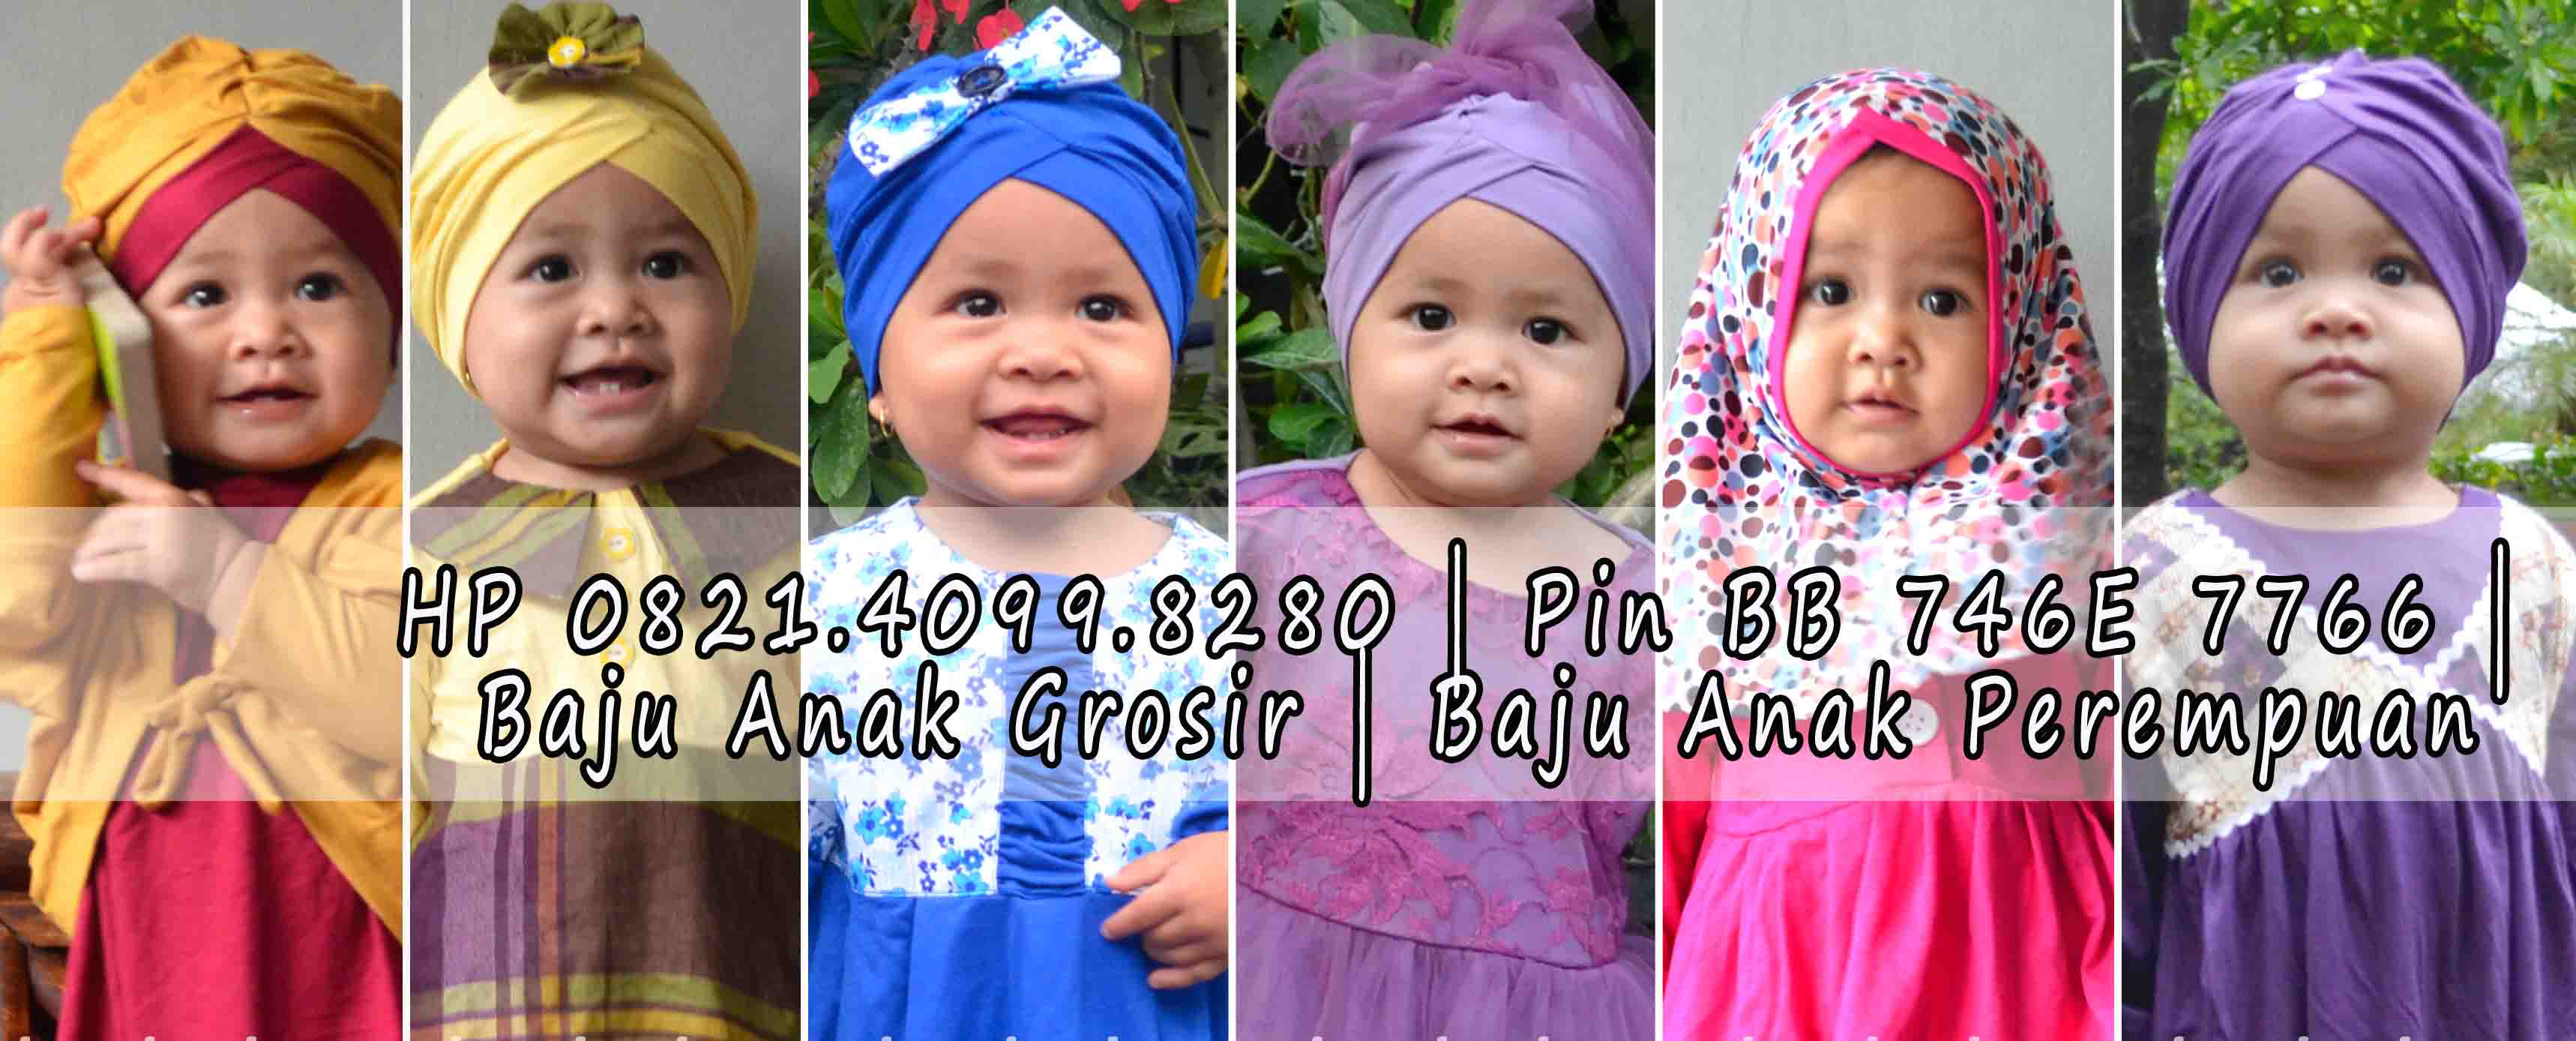 Baju Anak Muslim Perempuan Grosir Baju Anak Surabaya Call SMS